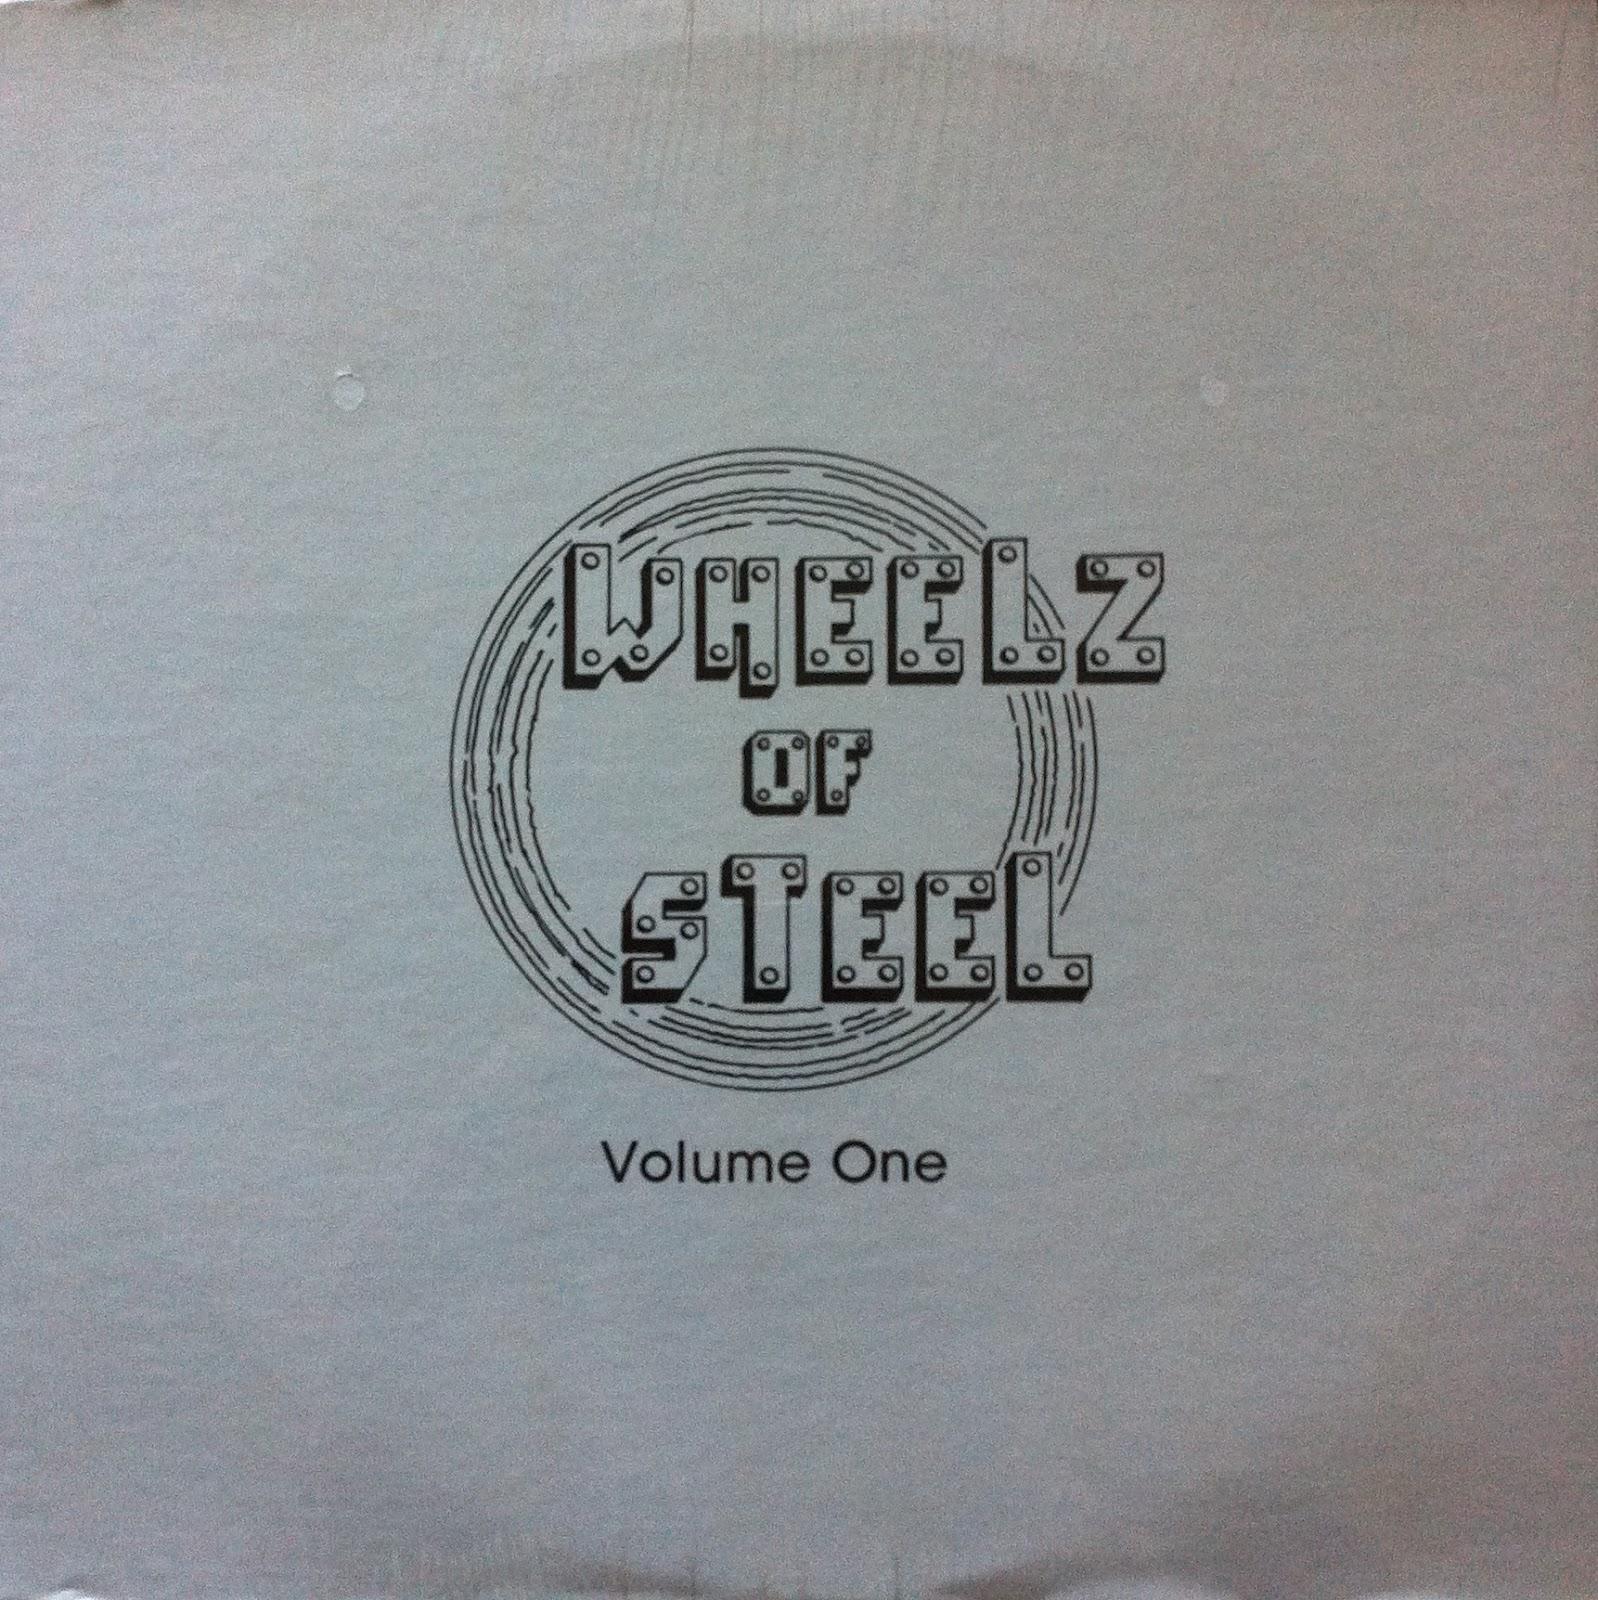 Wheelz Of Steel Volume One